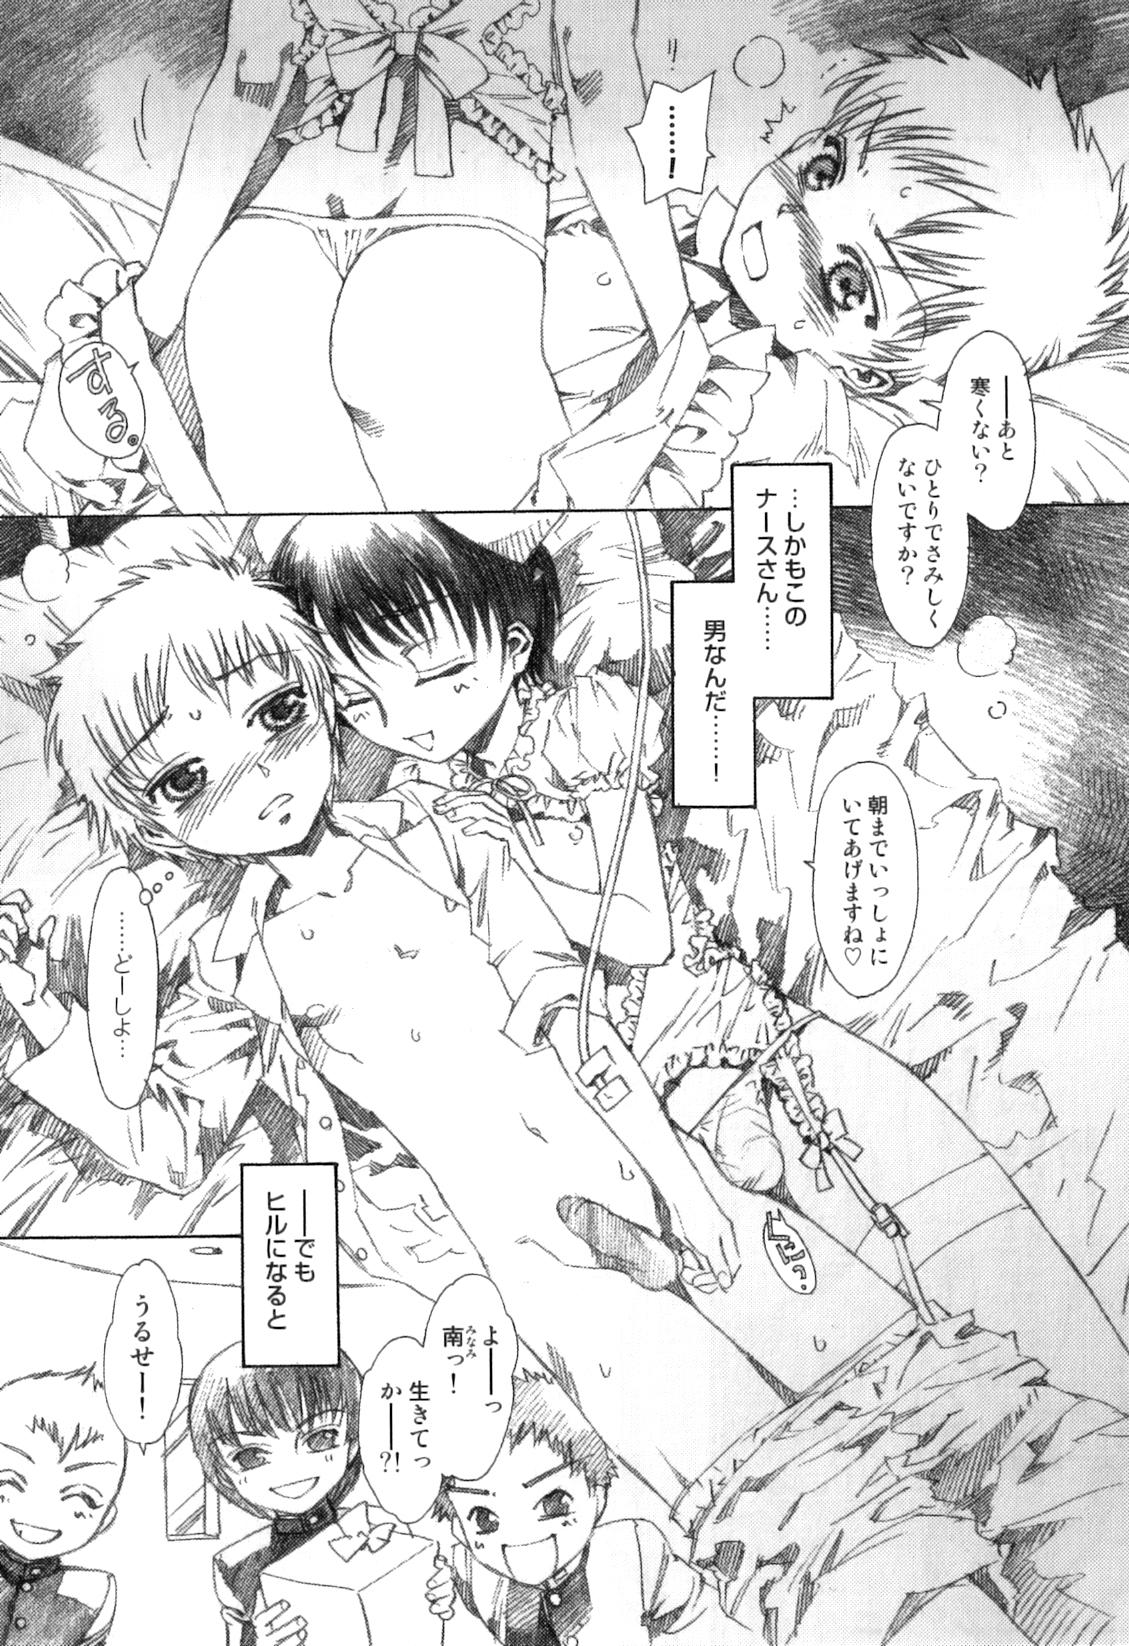 Yuni-Hapi 93